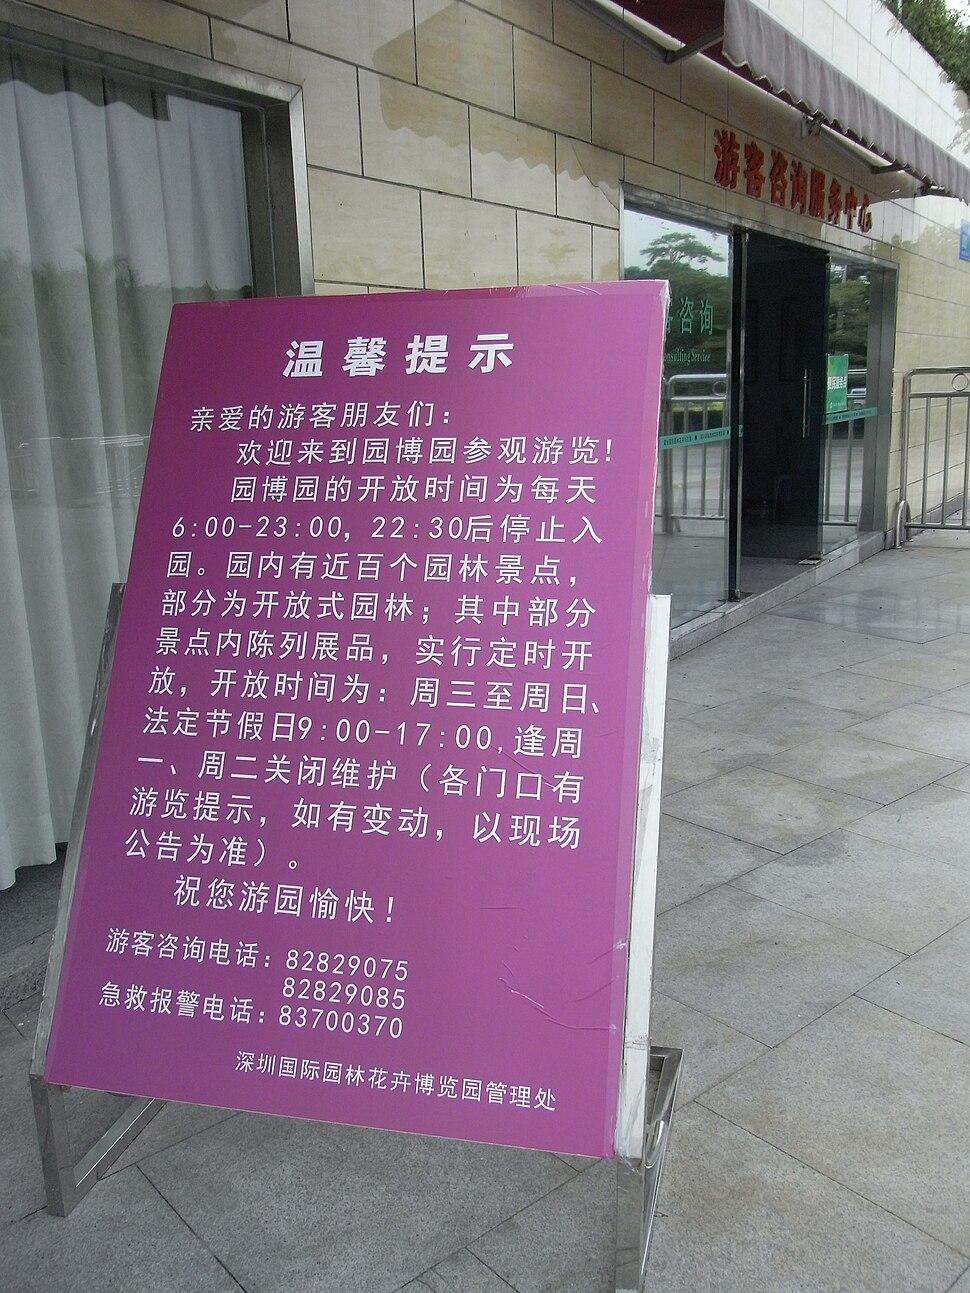 SZ Tour 深圳園博園 Shenzhen International Garden and Flower Expo Park opening hours Aug-2010